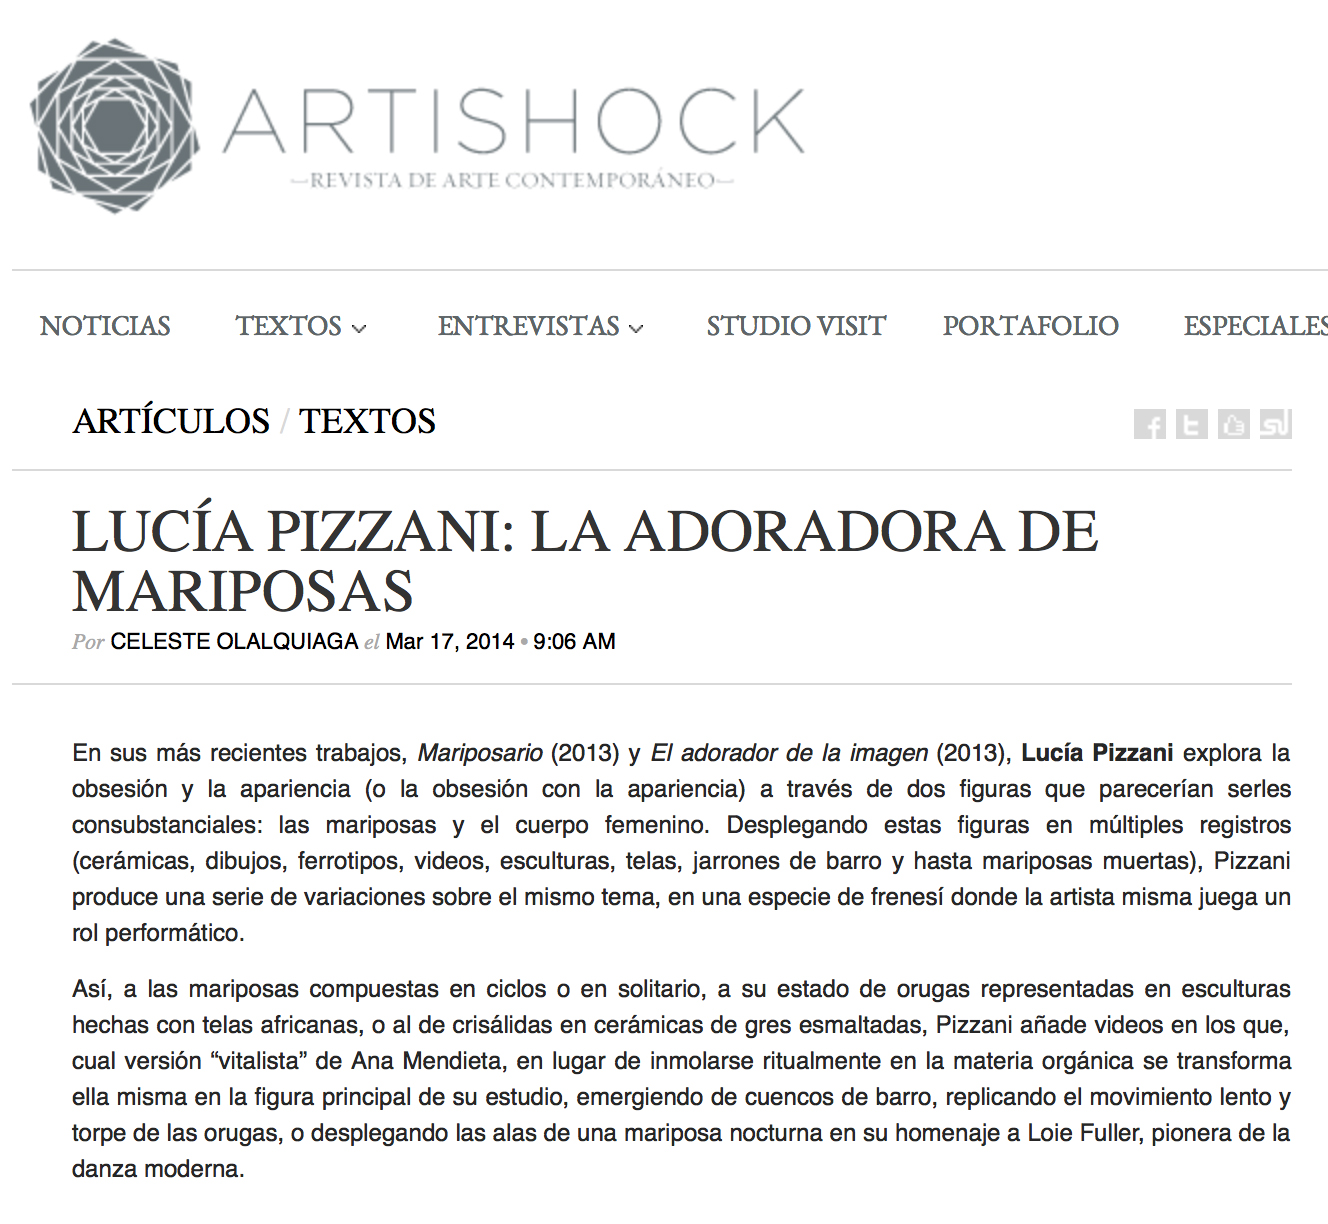 Artishock.jpg